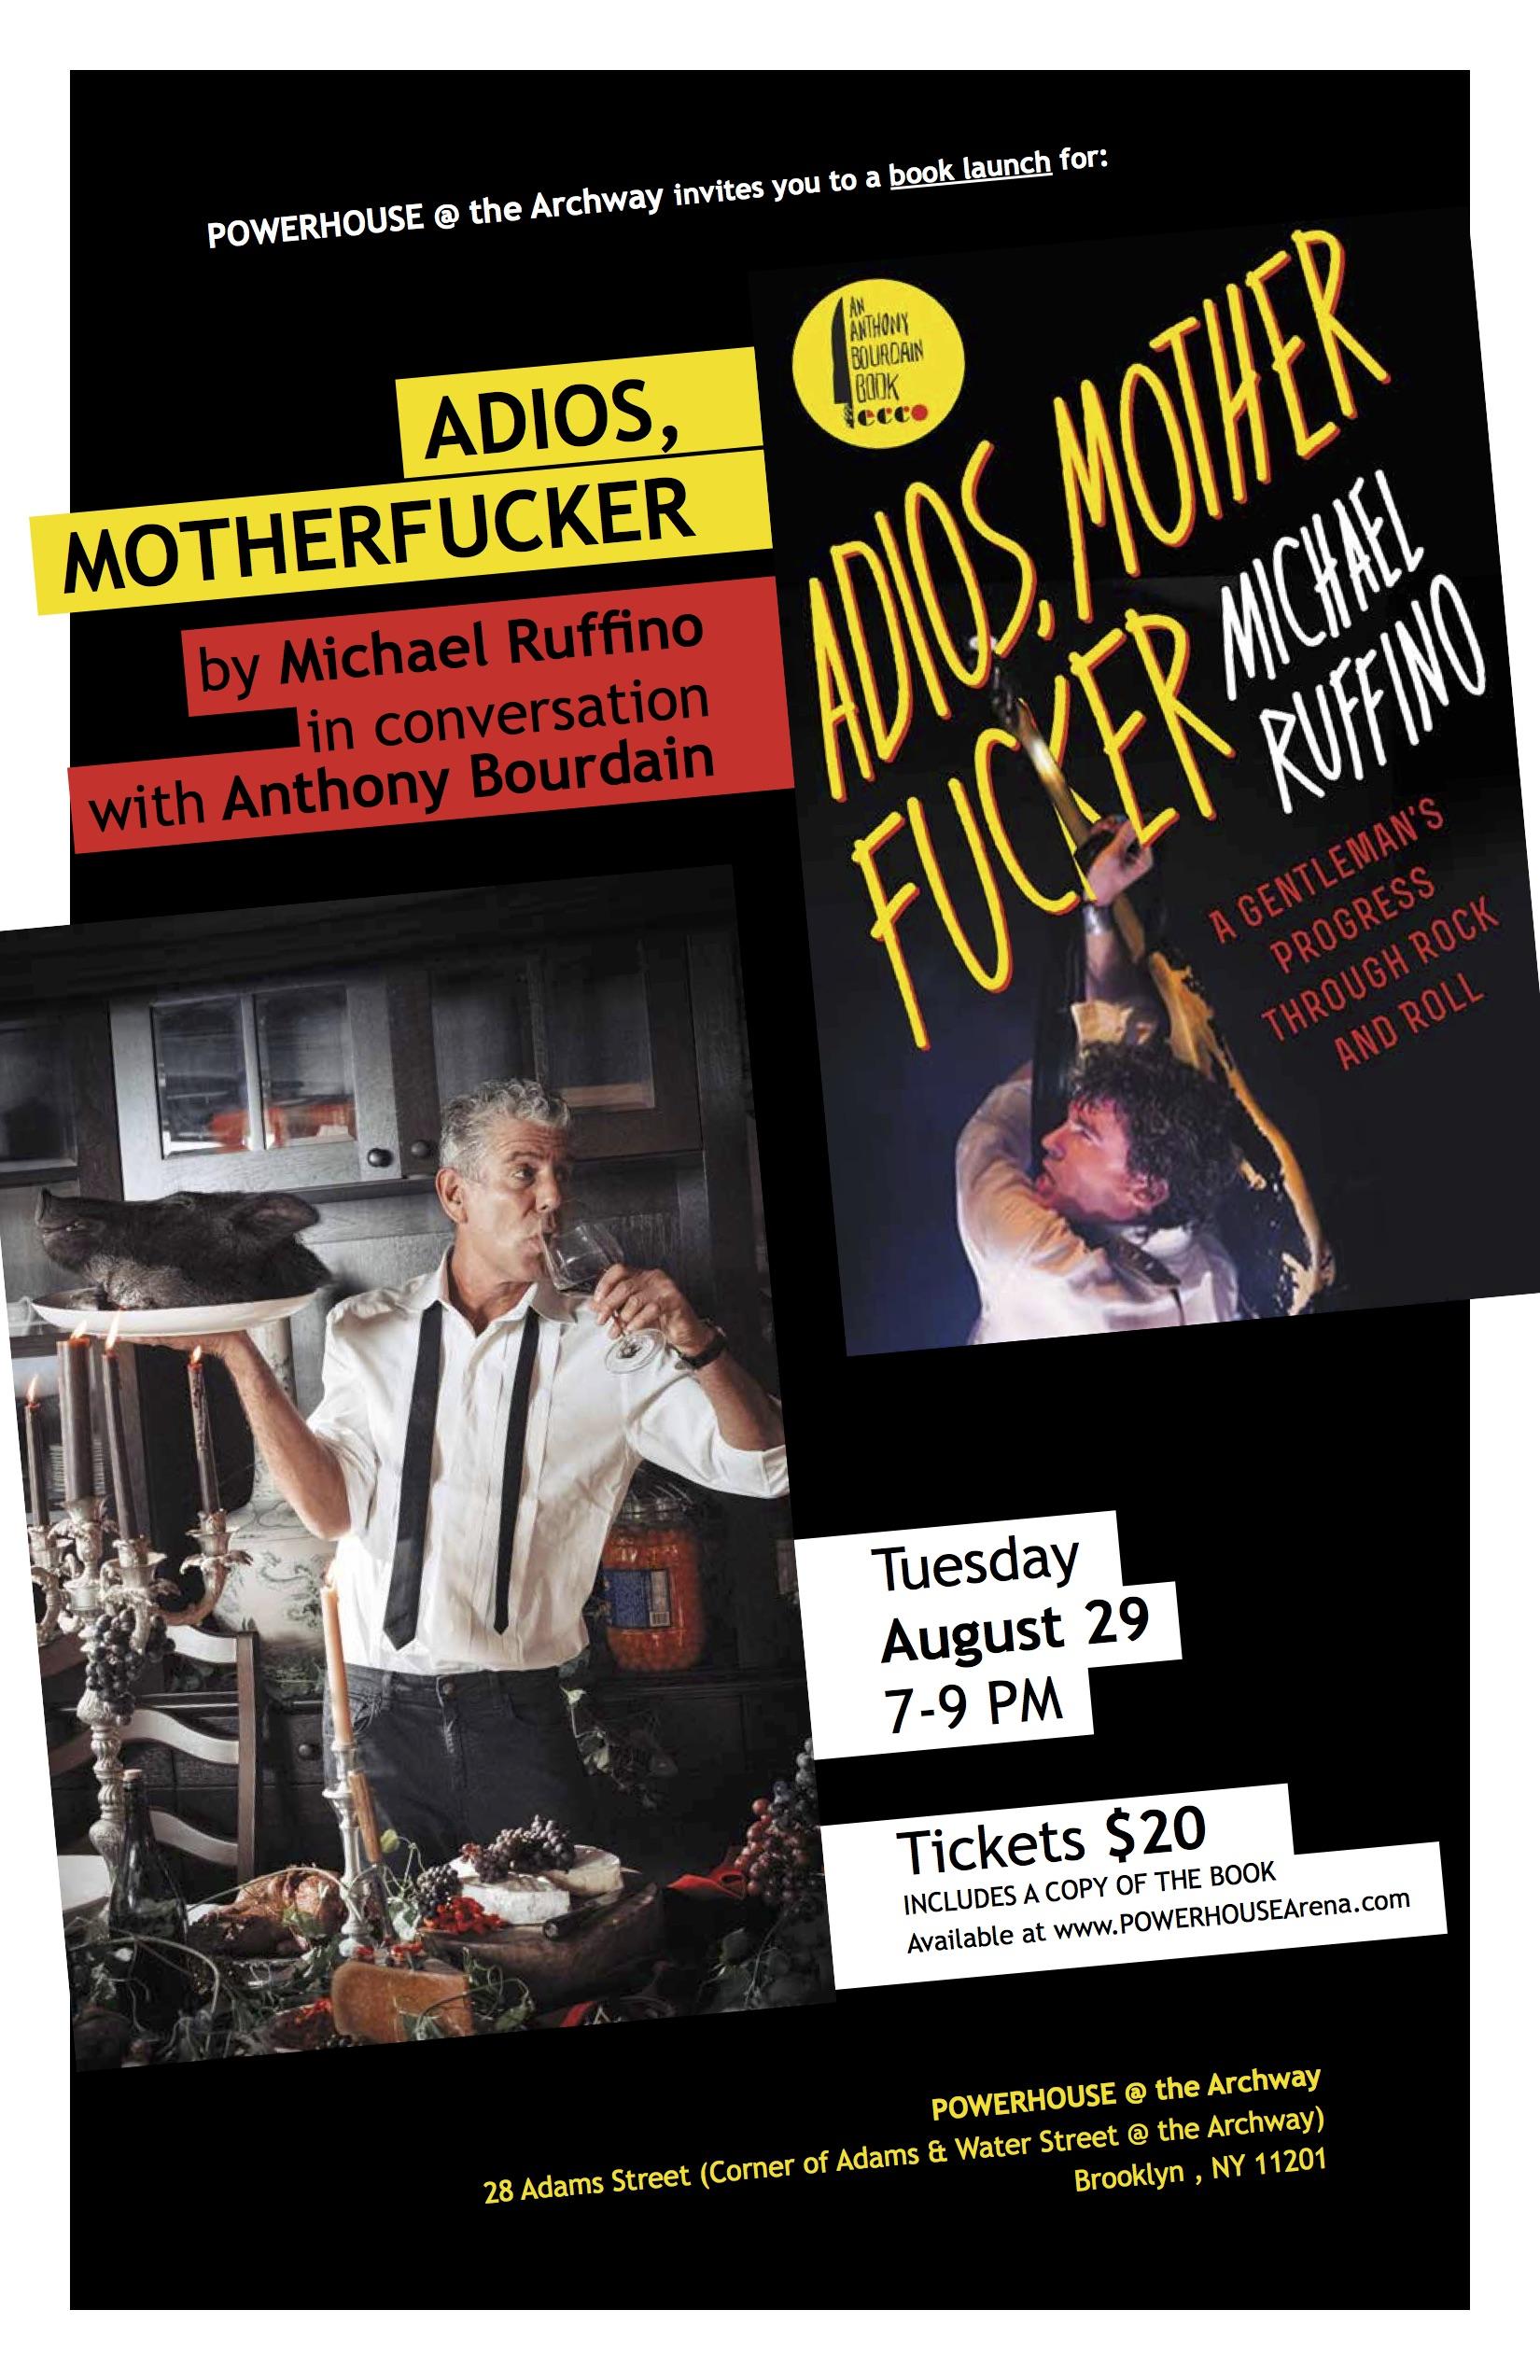 Book Launch: Adios, Motherfucker by Michael Ruffino — in conversation w/ Anthony Bourdain